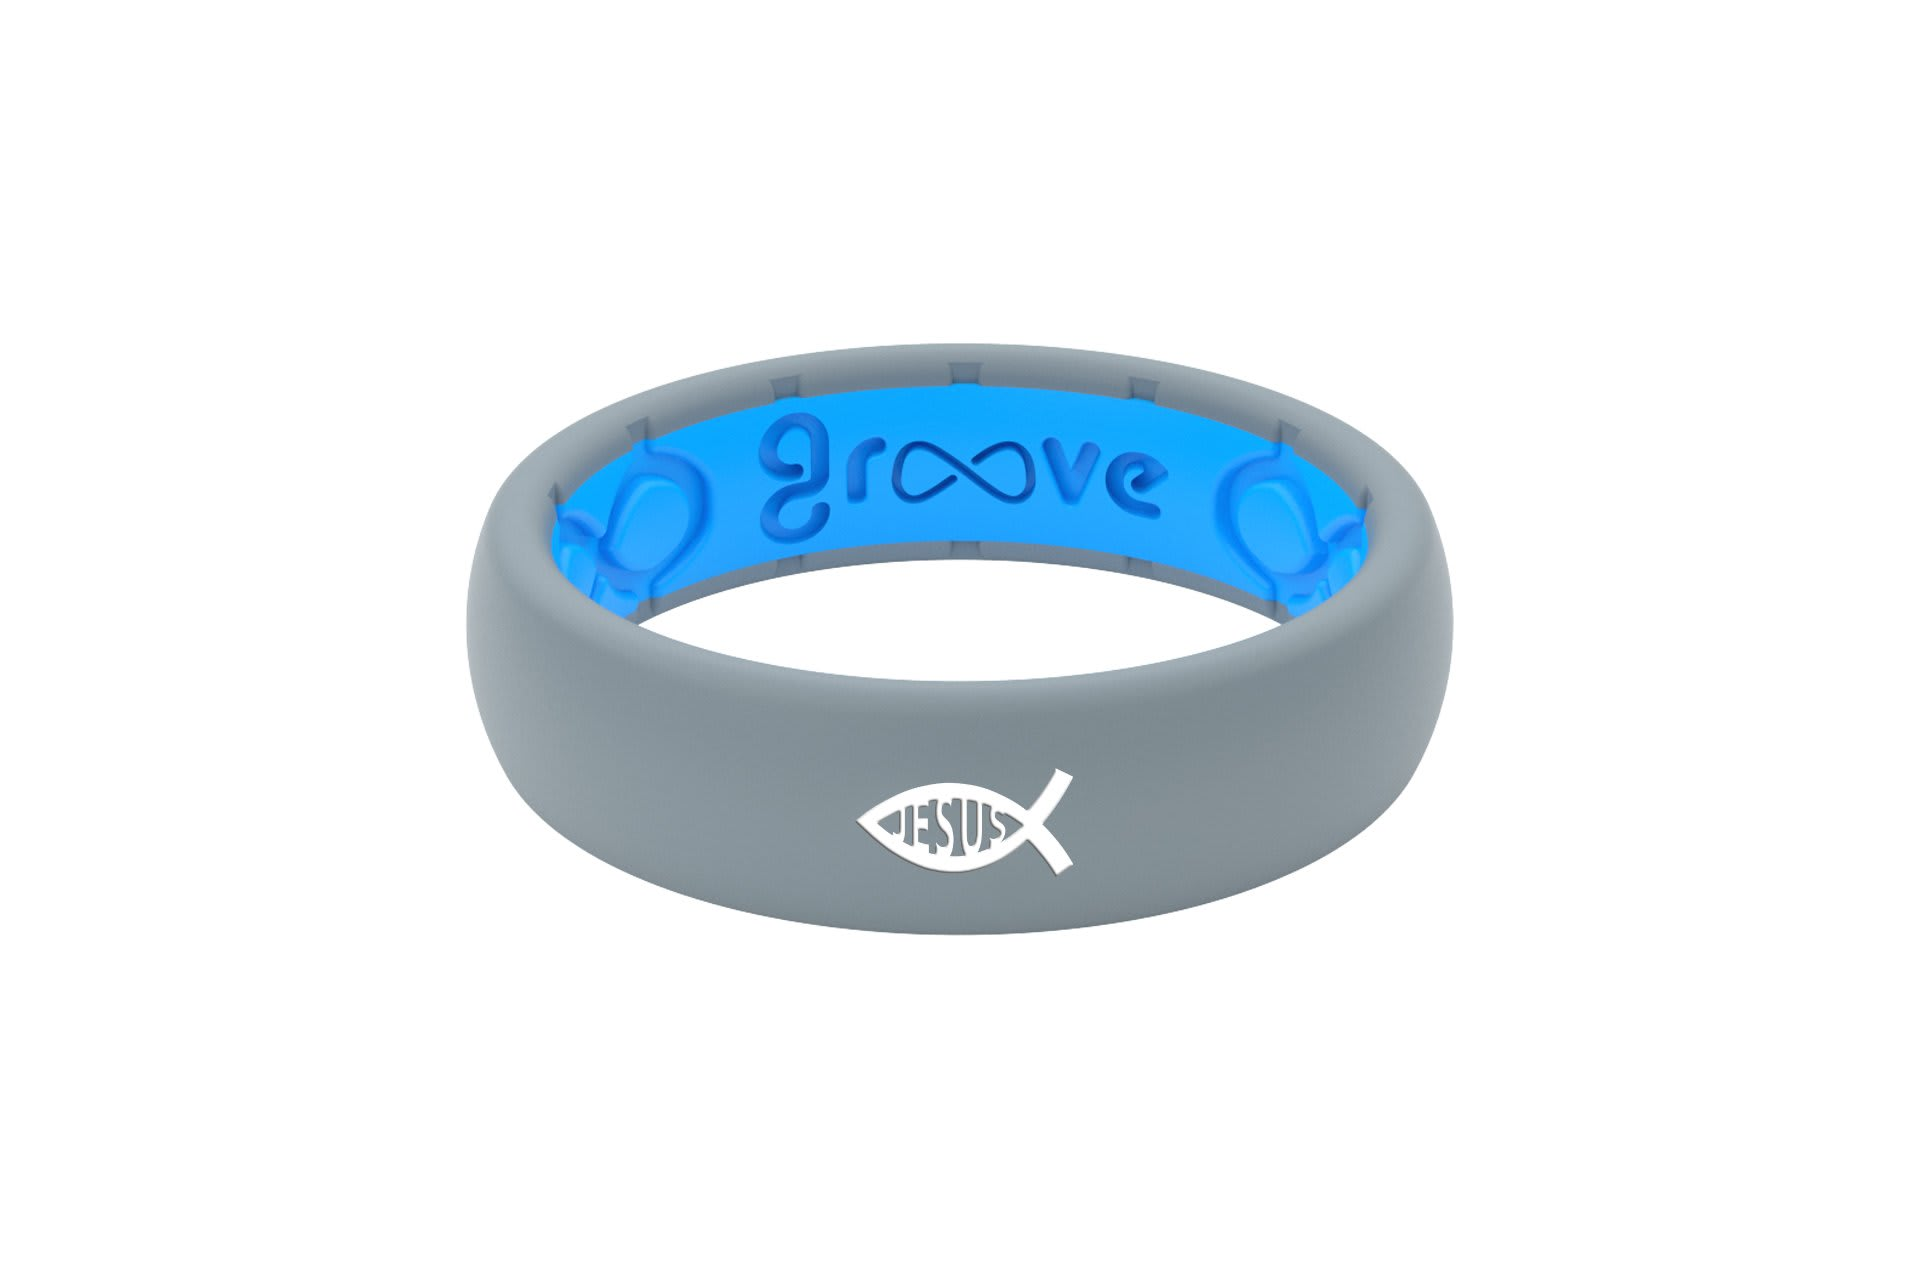 Thin Custom Ichthus Jesus Storm Grey/Blue - Groove Life